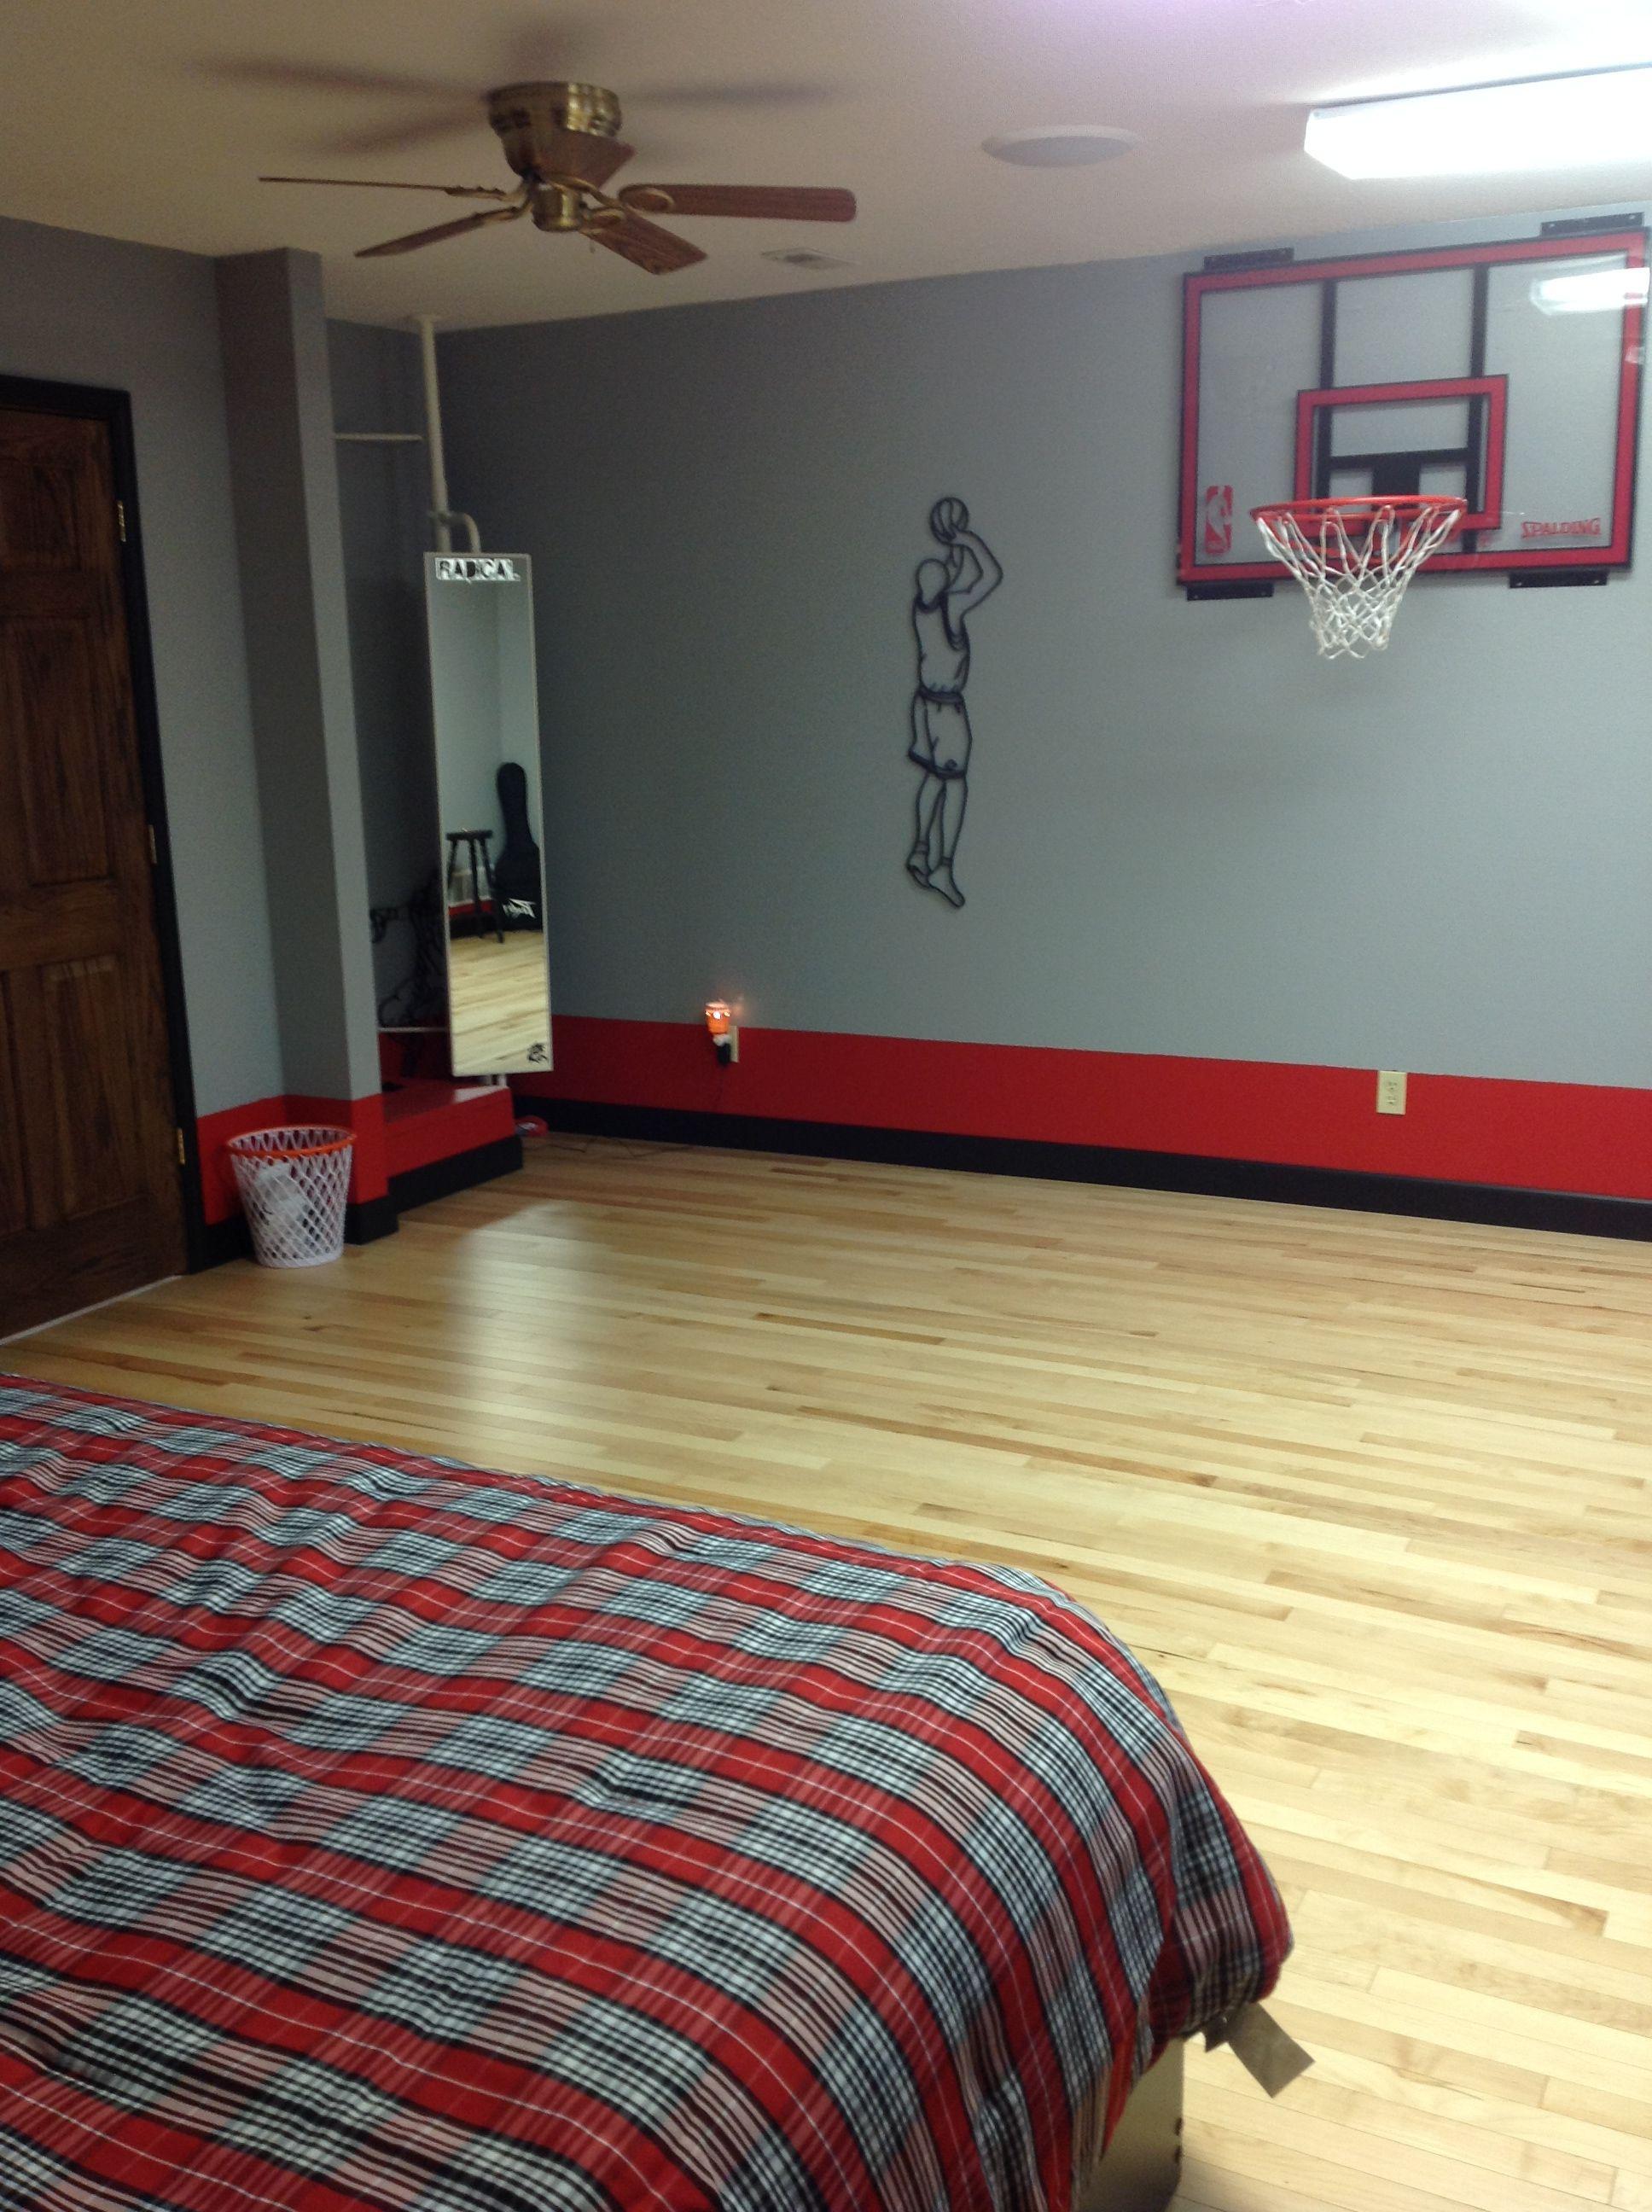 Teen basketball theme room beds bedrooms pinterest - Basketball bedroom ...